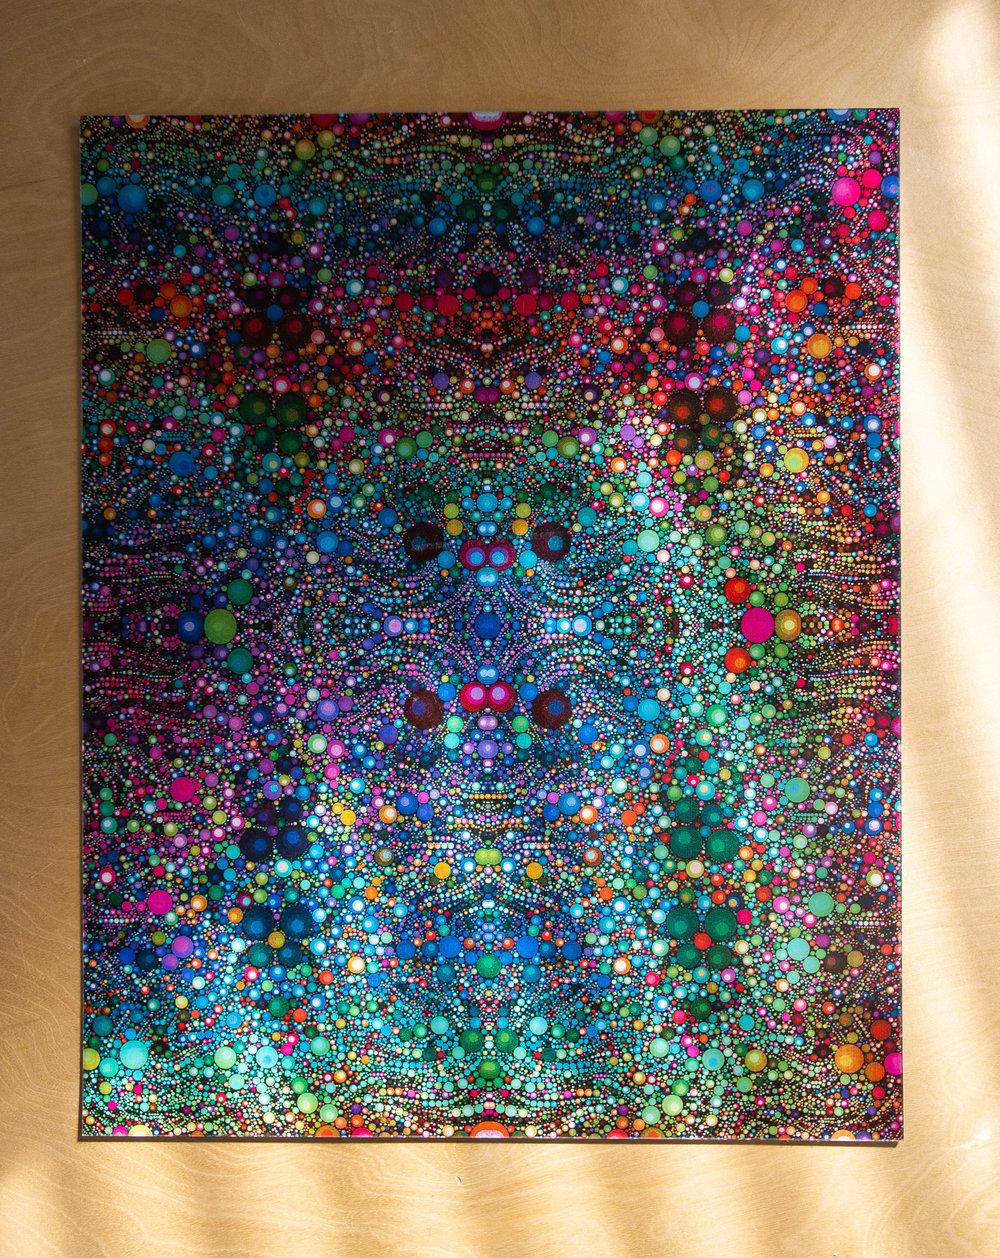 Infinite Reflections Lenticular Print